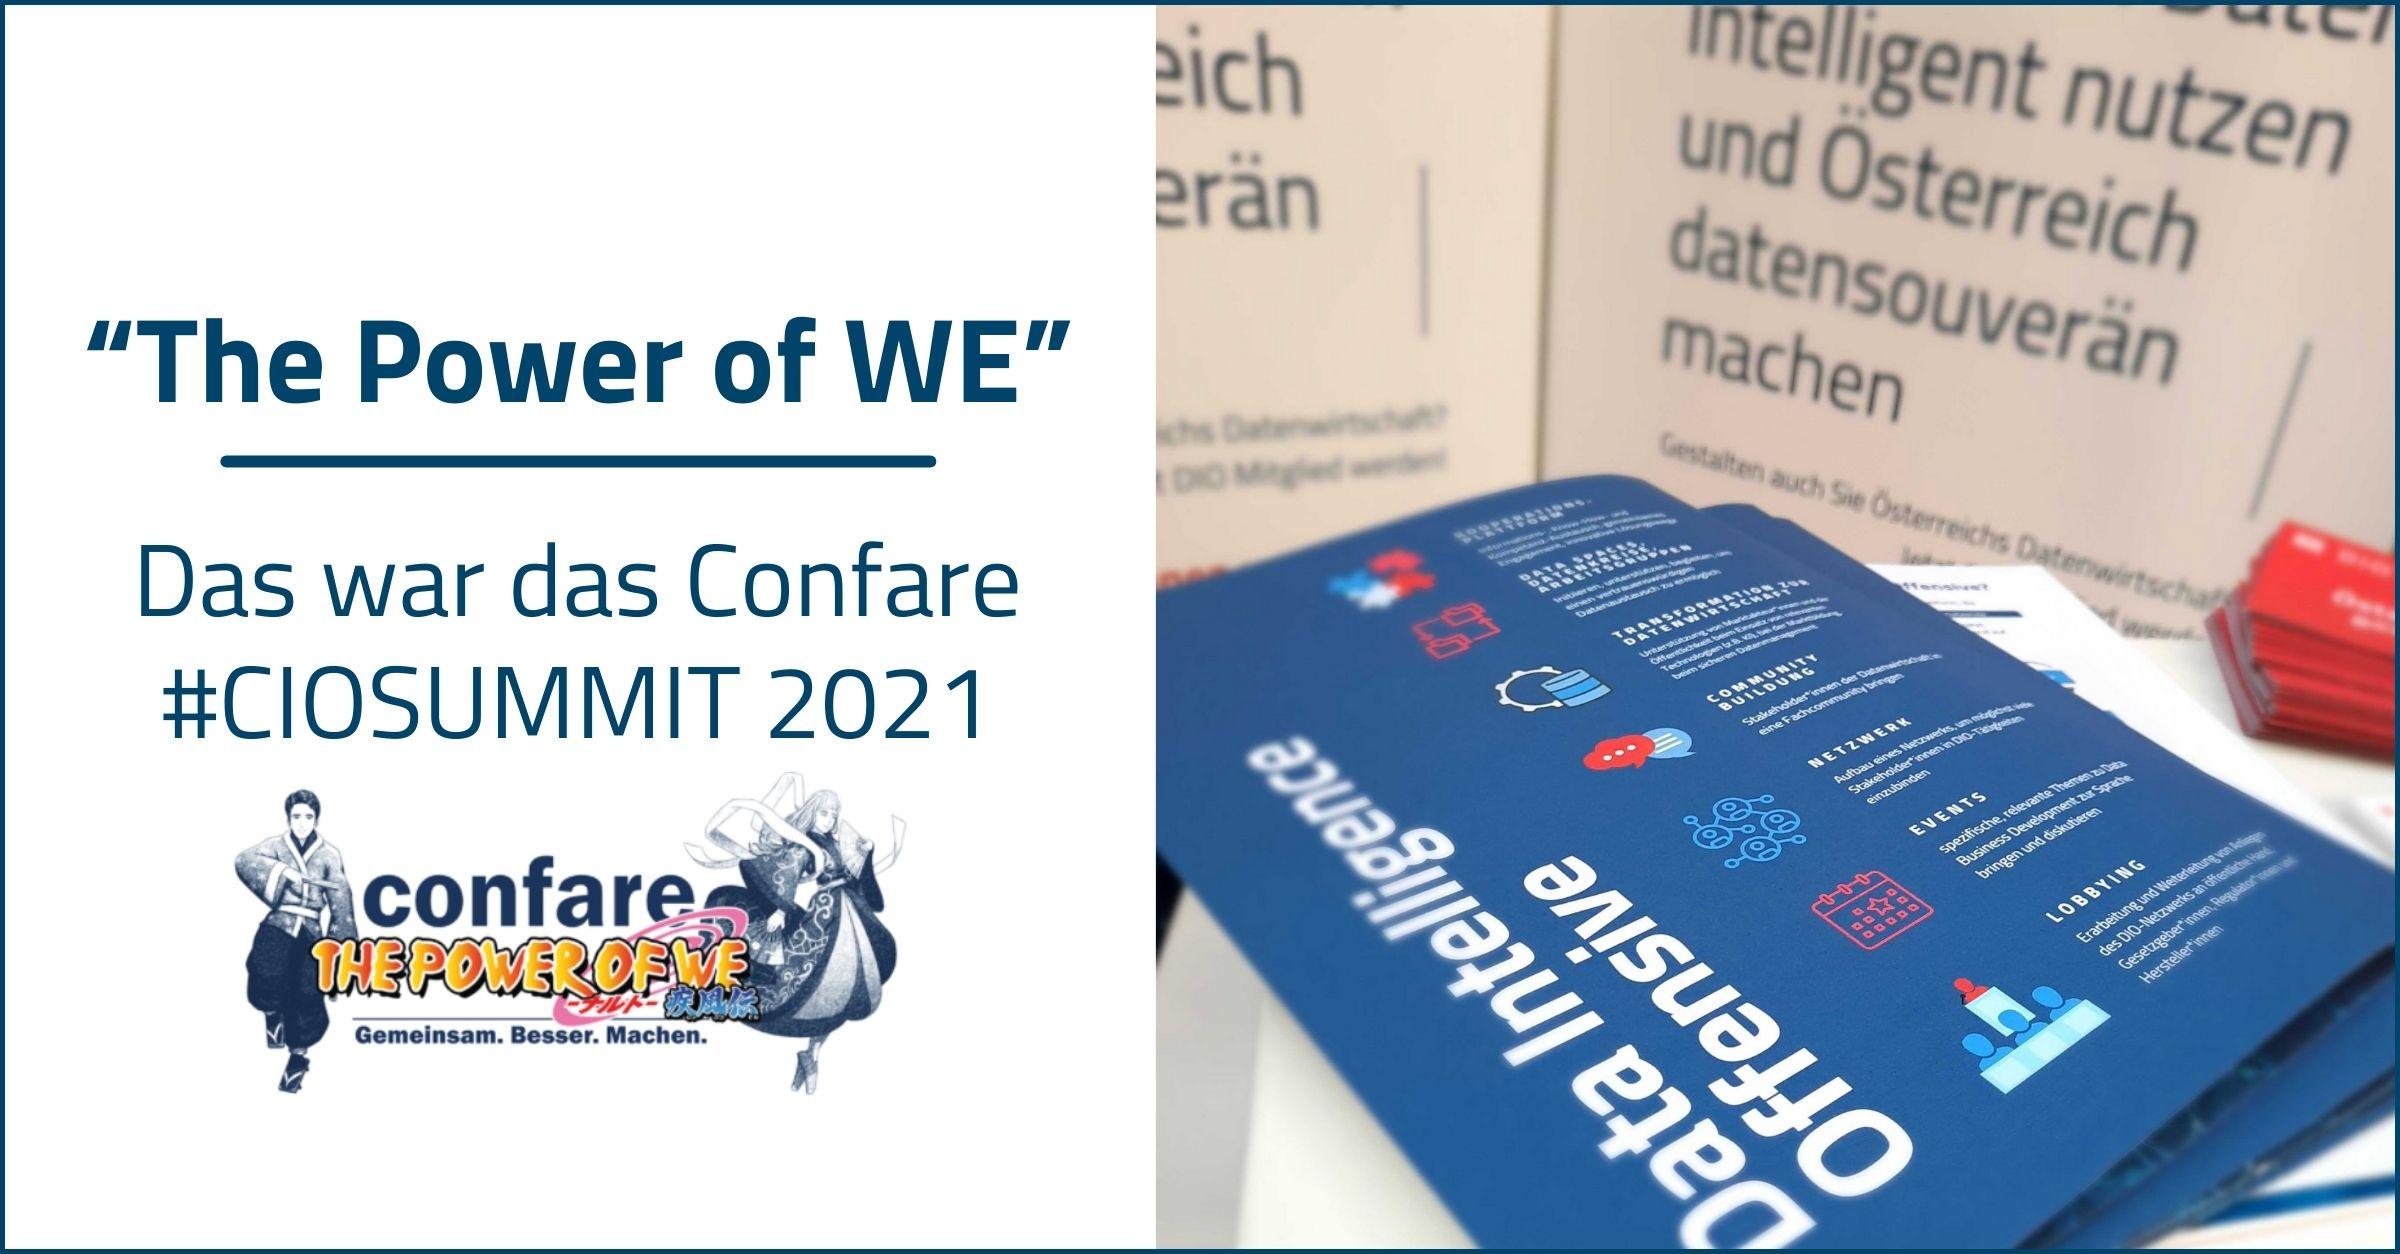 The Power of WE - Das war das Confare #CIOSUMMIT 2021